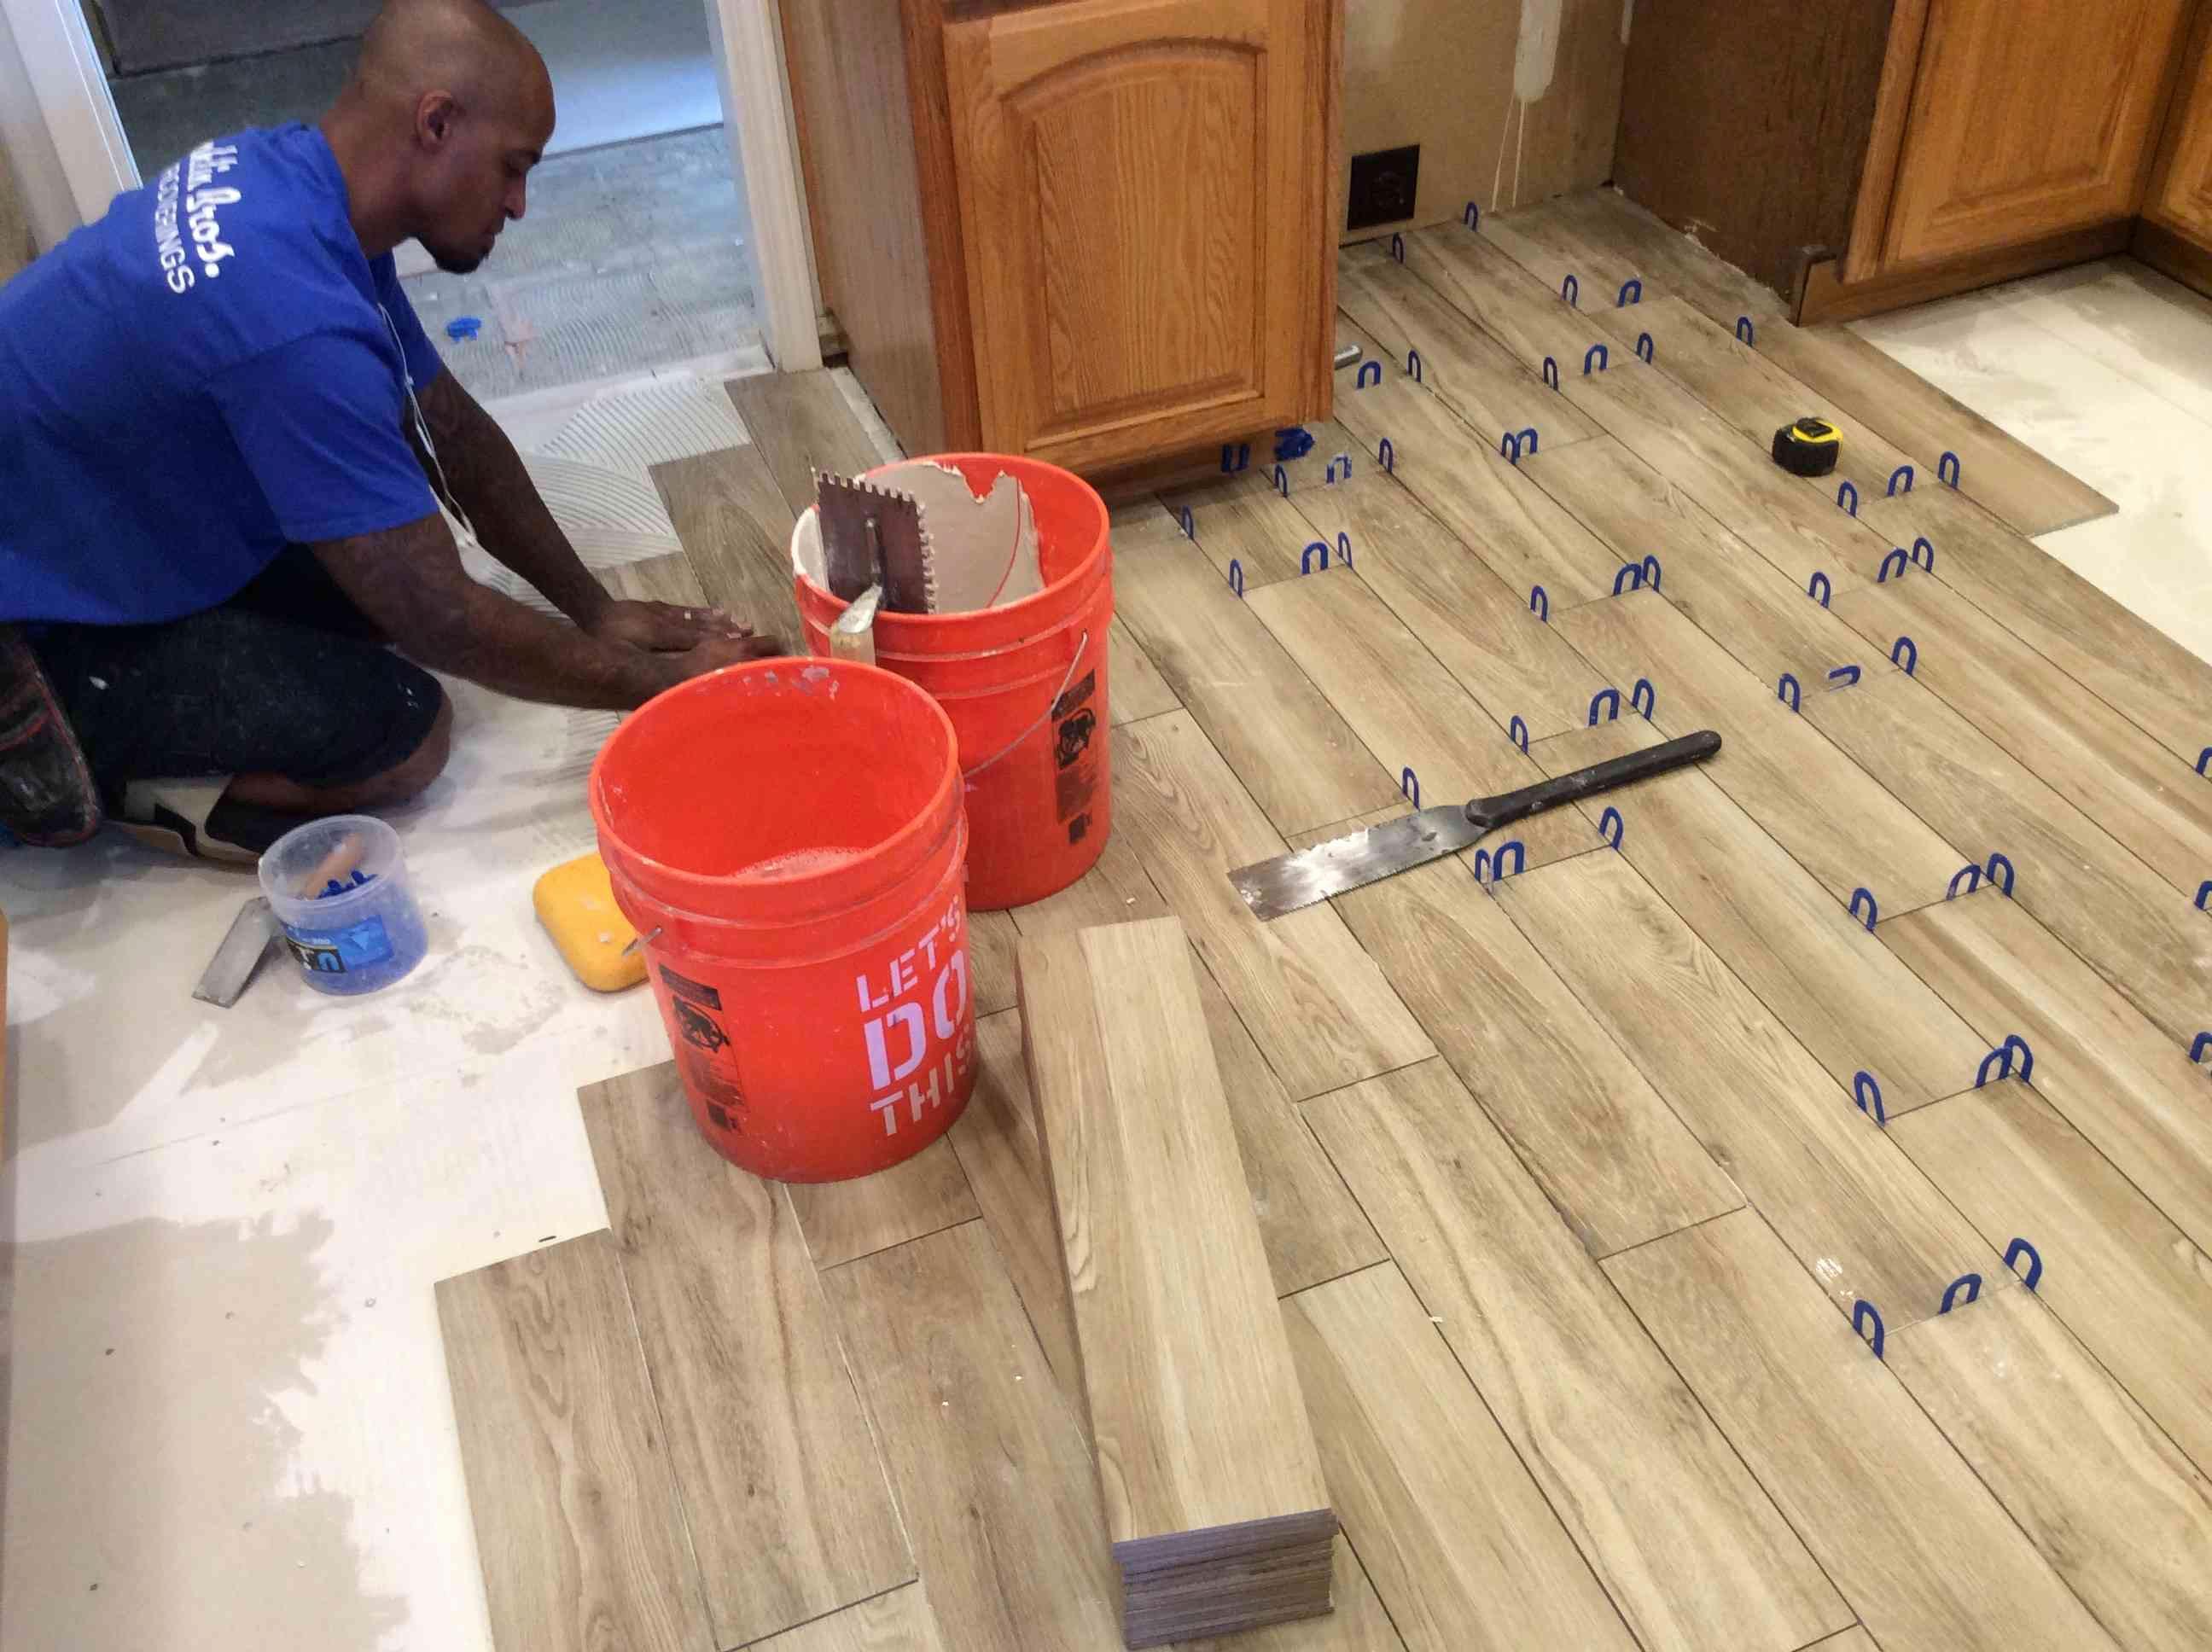 minwax hardwood floor stain of red wood floors luxury minwax stain for red oak floors pinterest intended for red wood floors awesome 50 best real hardwood floors 50 s of red wood floors luxury